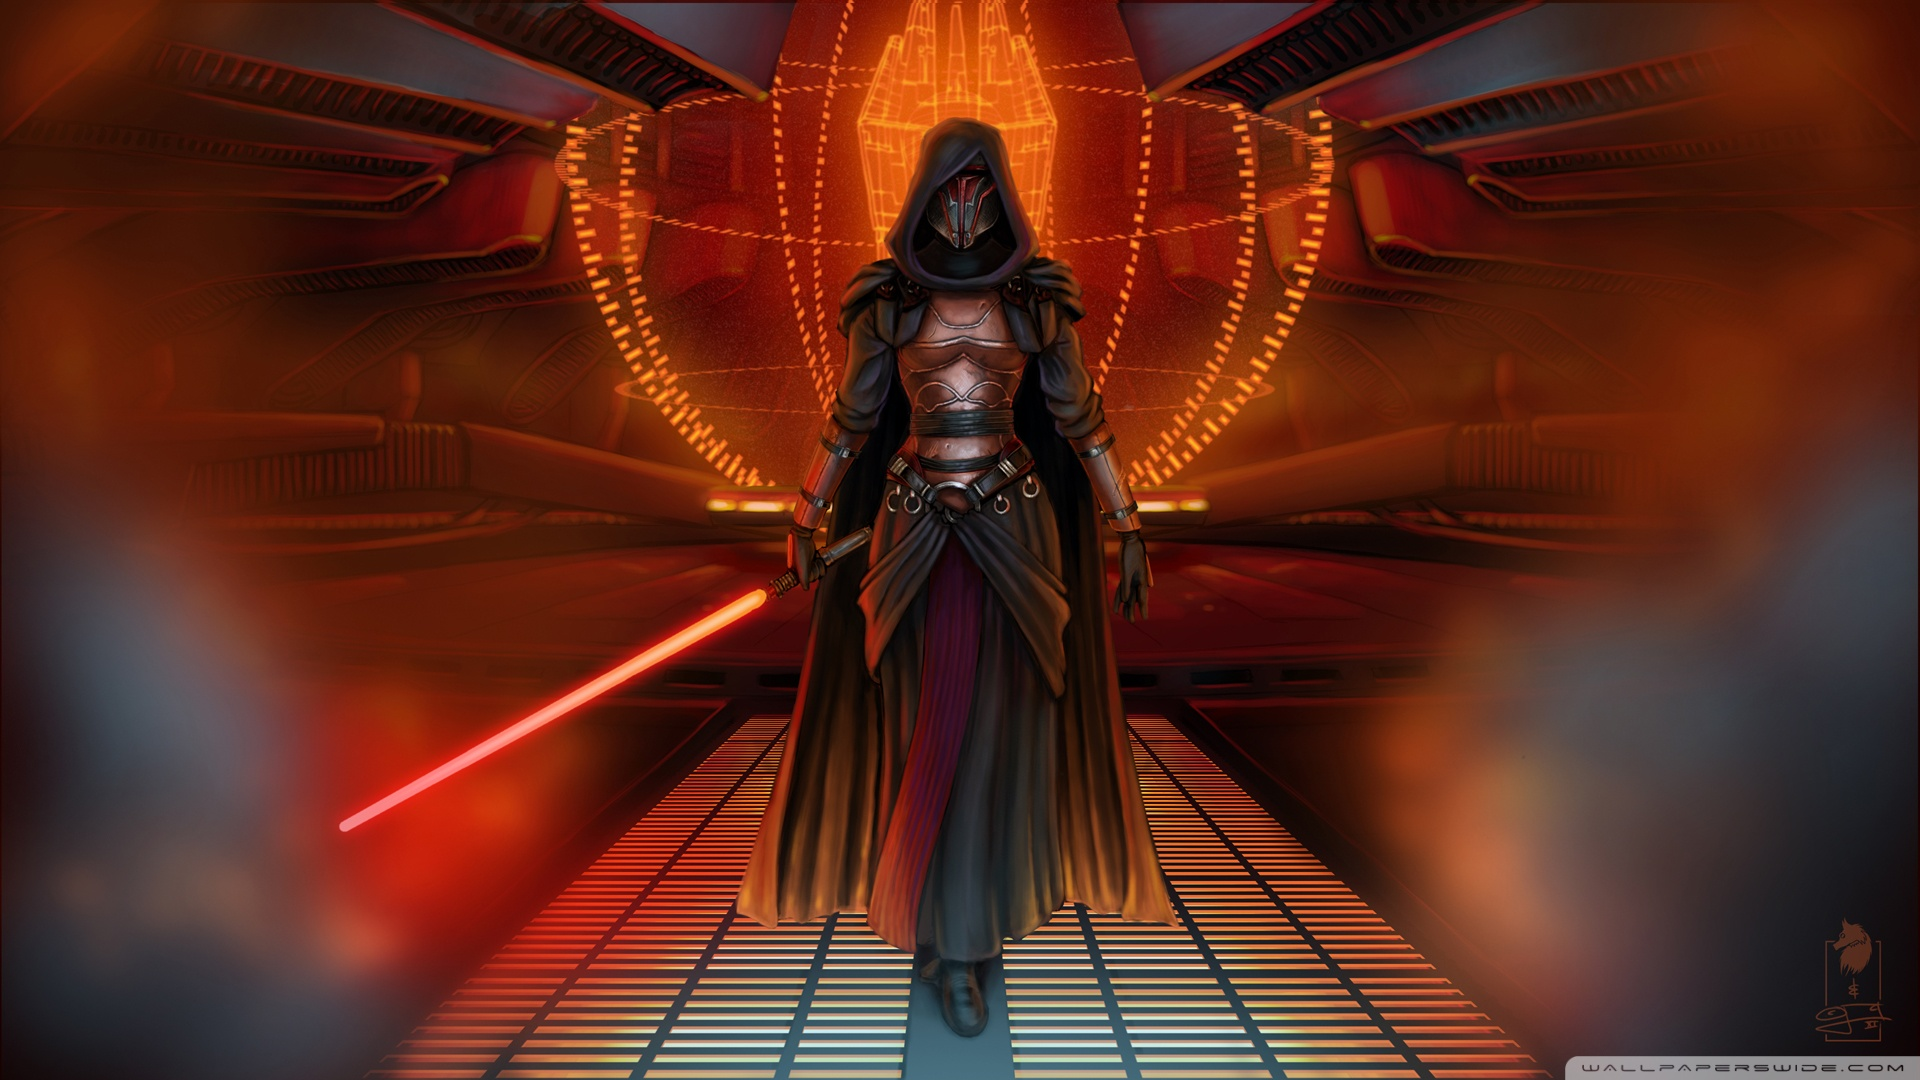 Star Wars Darth Nihilus Wallpaper